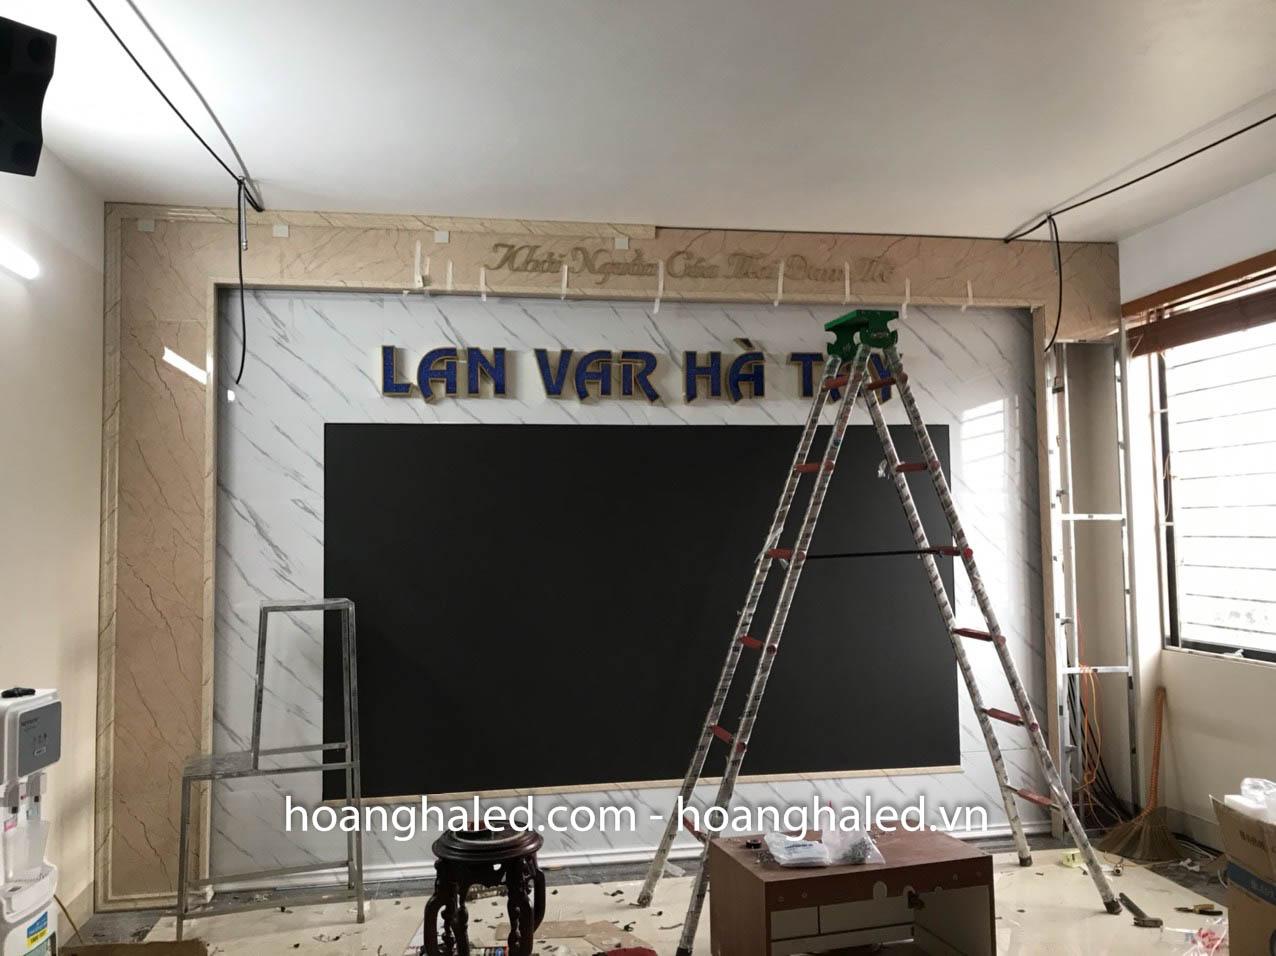 man_hinh_led_p2_trong_nha_tai_lan_var_ha_tay_1